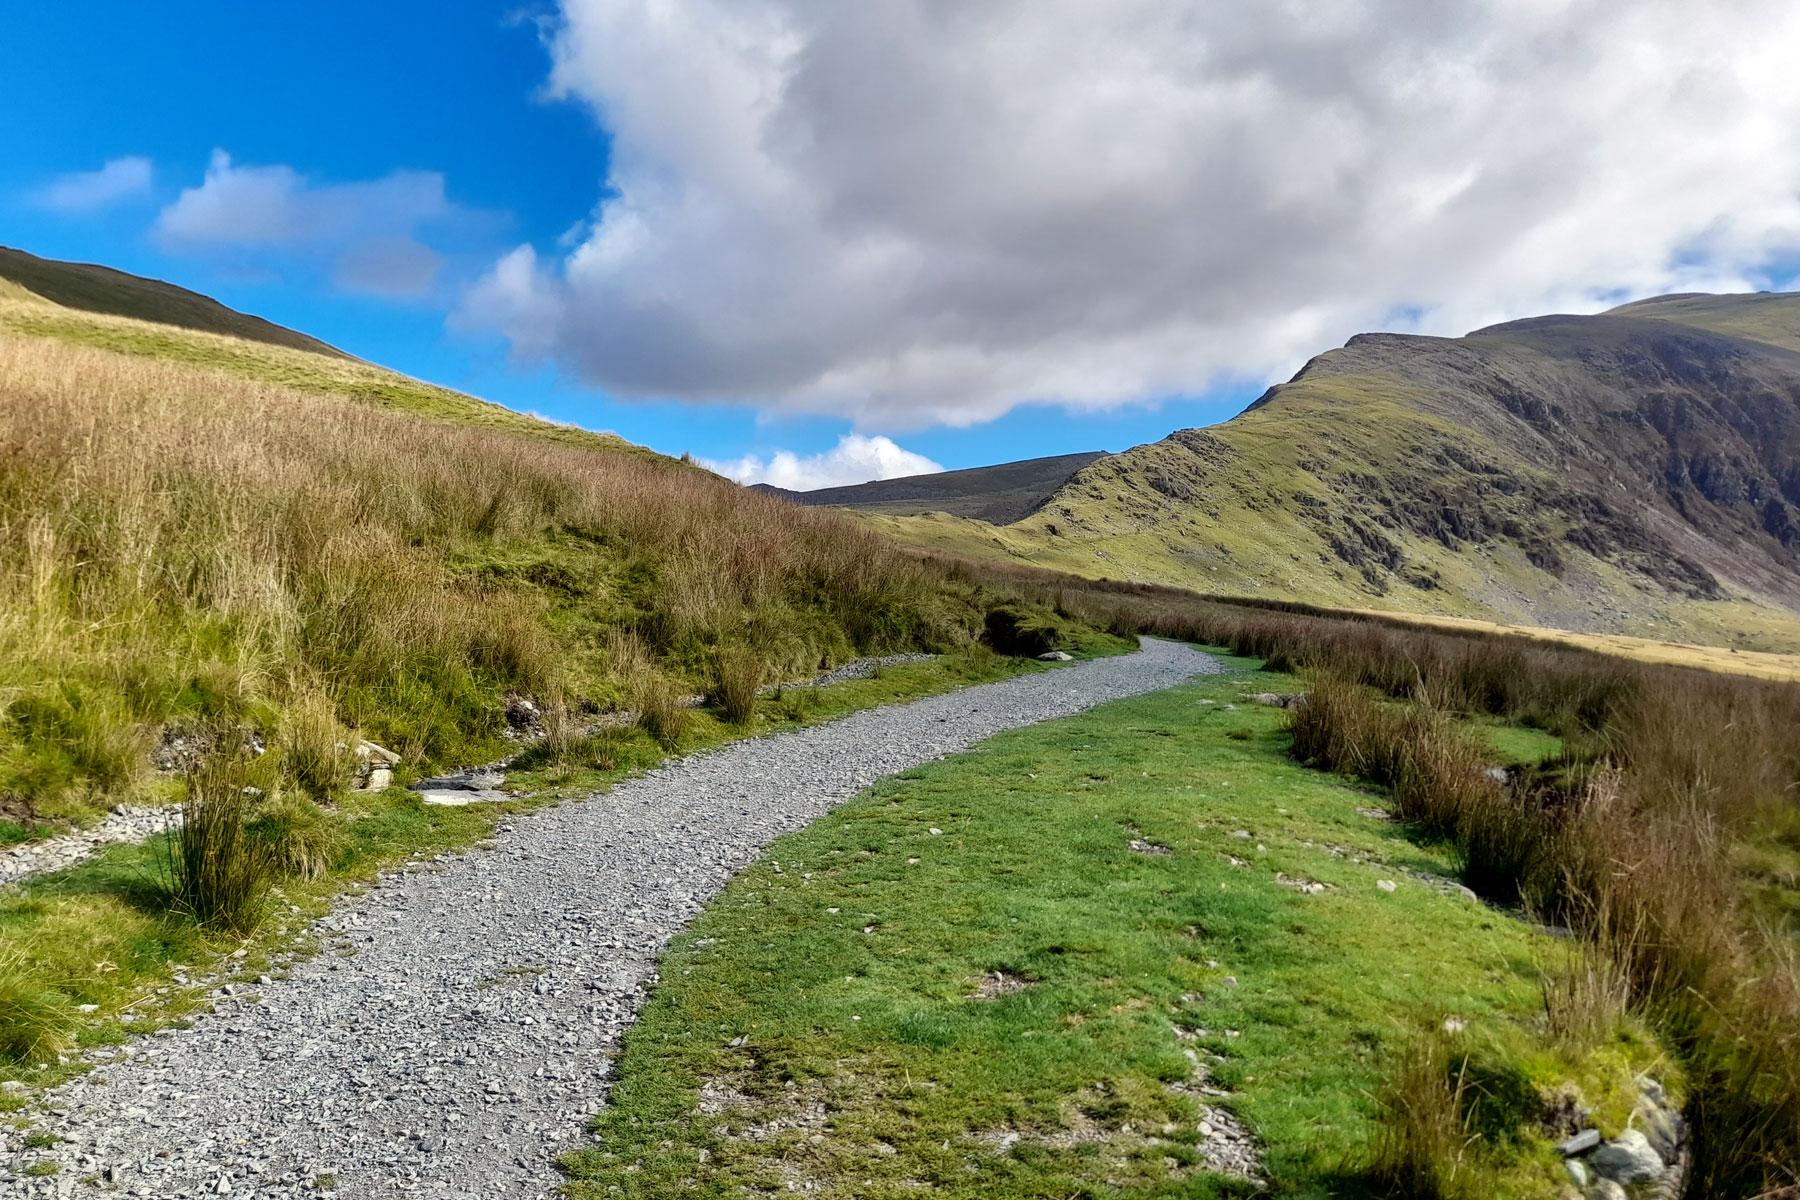 Climbing Snowdon on the Rangers Path